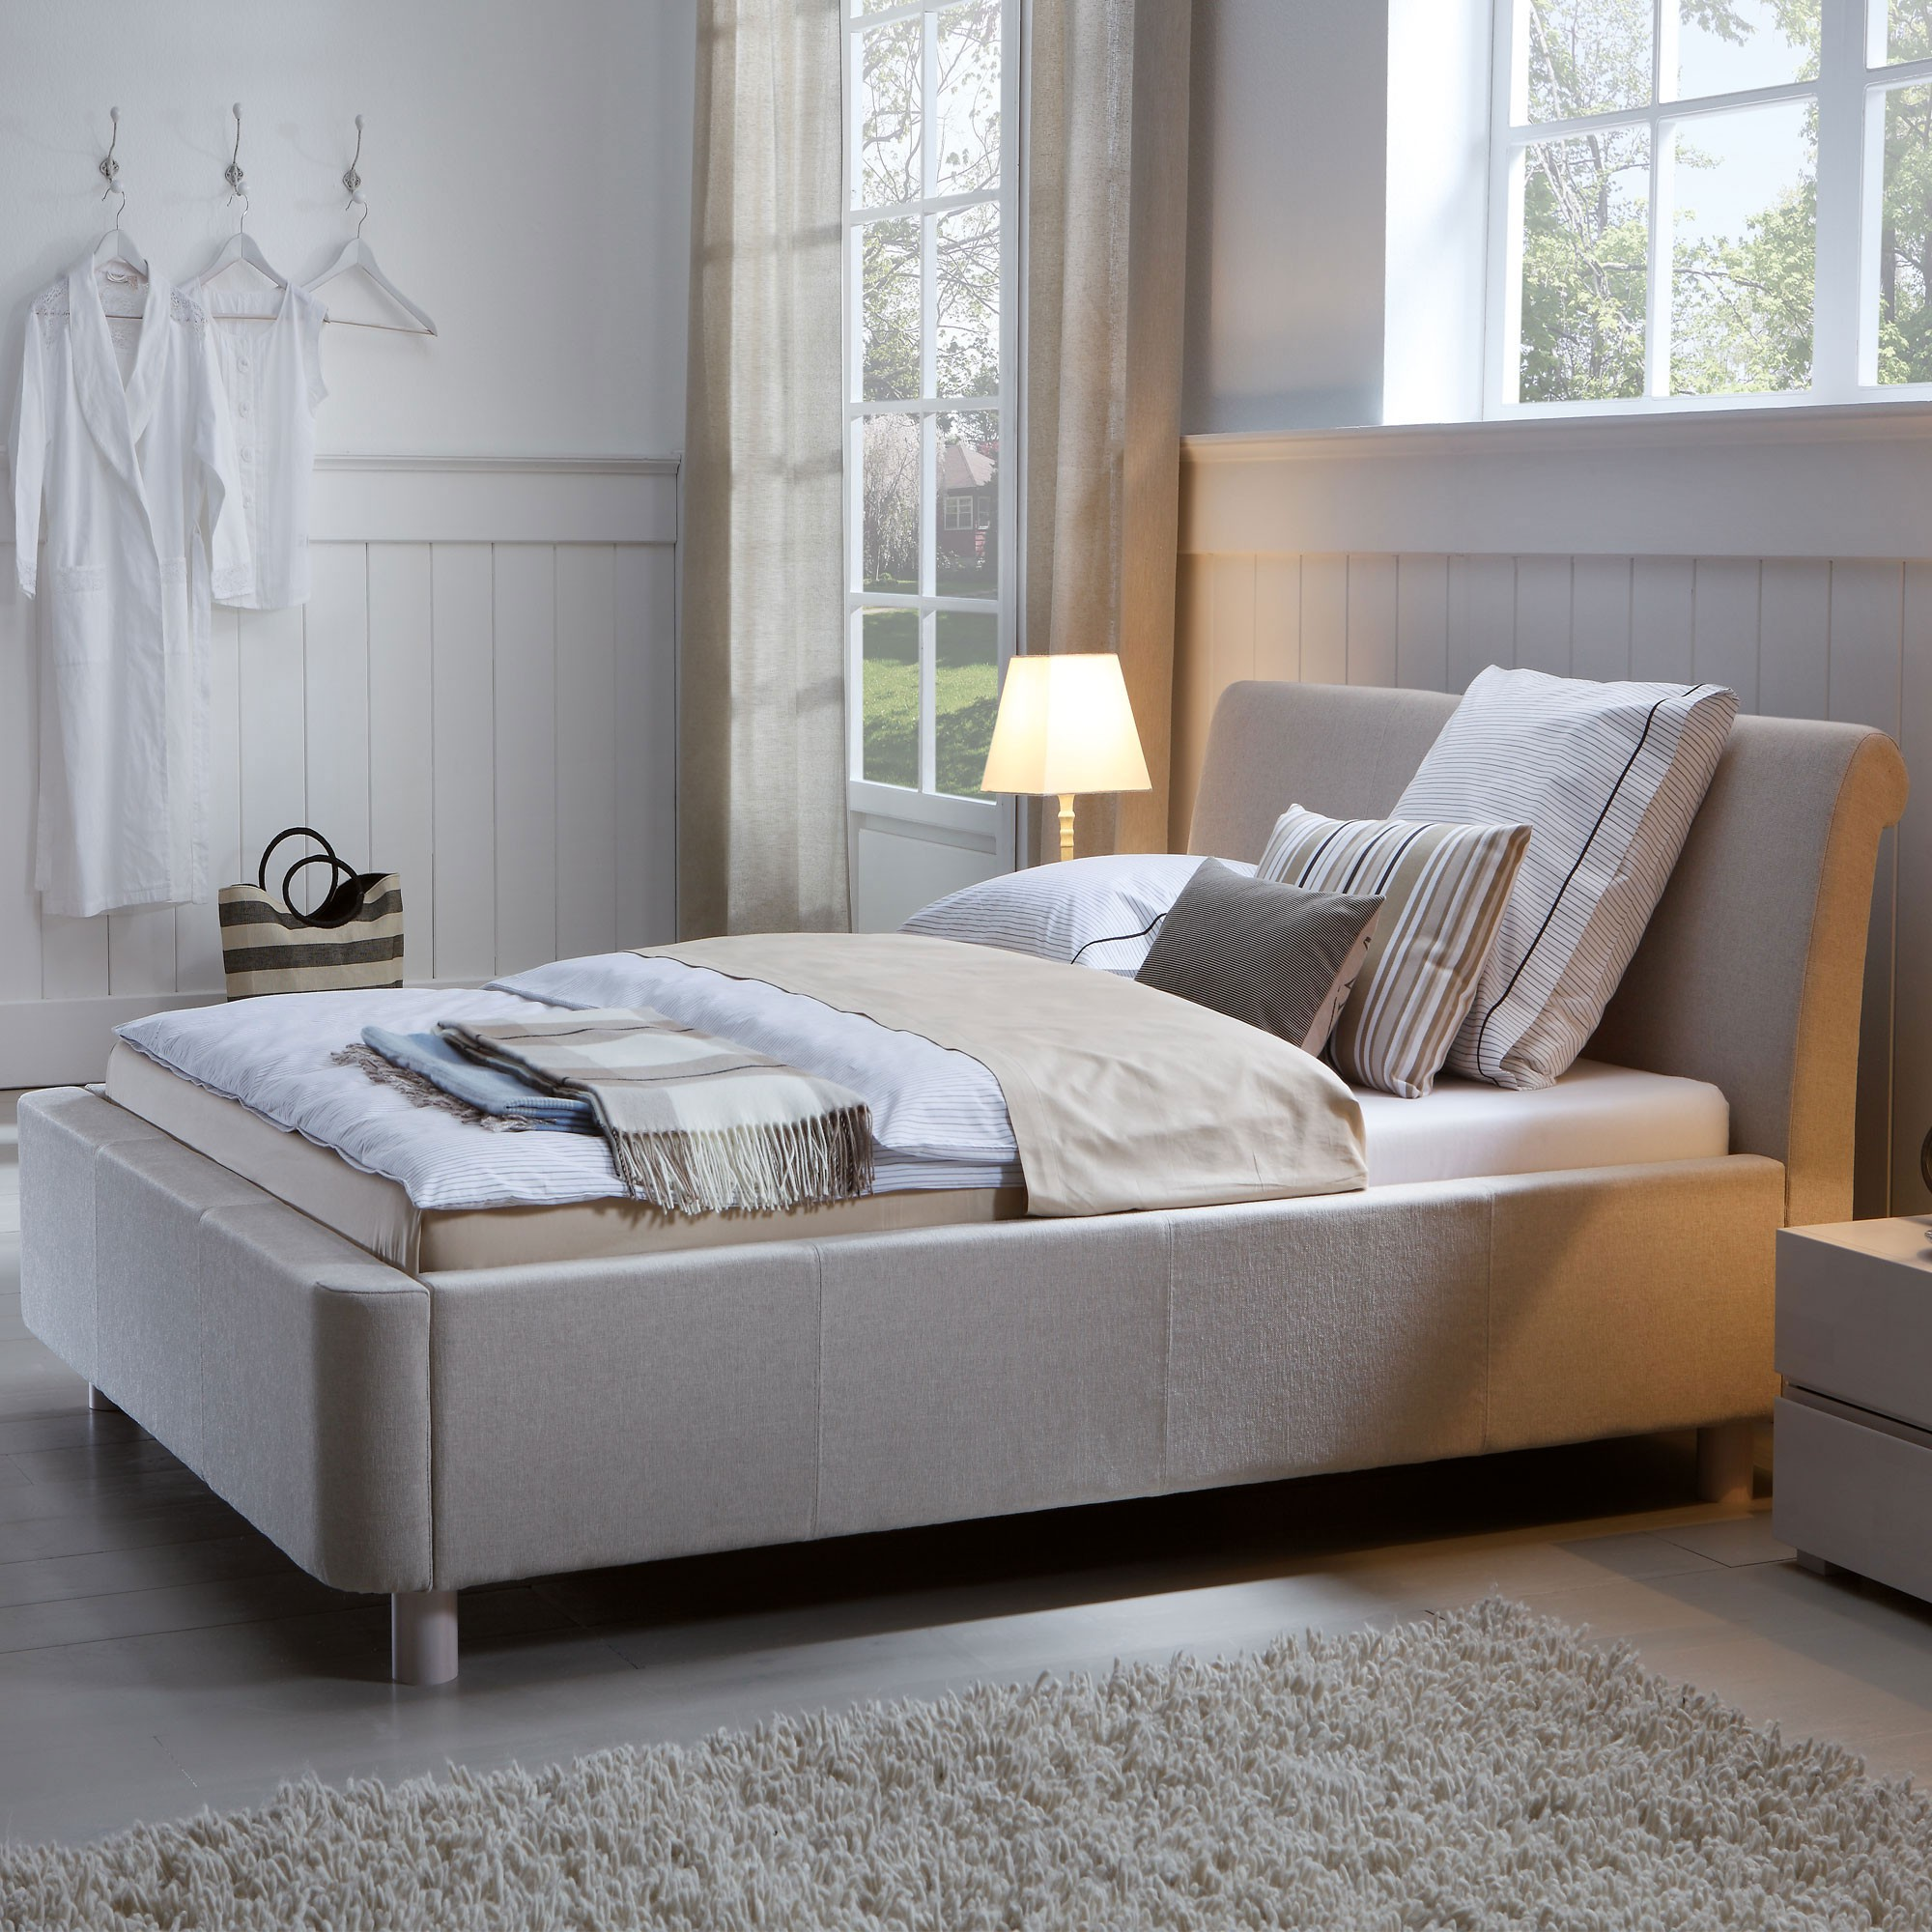 Full Size of Polsterbett 200x220 Hasena Dream Line Rondo Monte Zamo Online Kaufen Belama Bett Betten Wohnzimmer Polsterbett 200x220